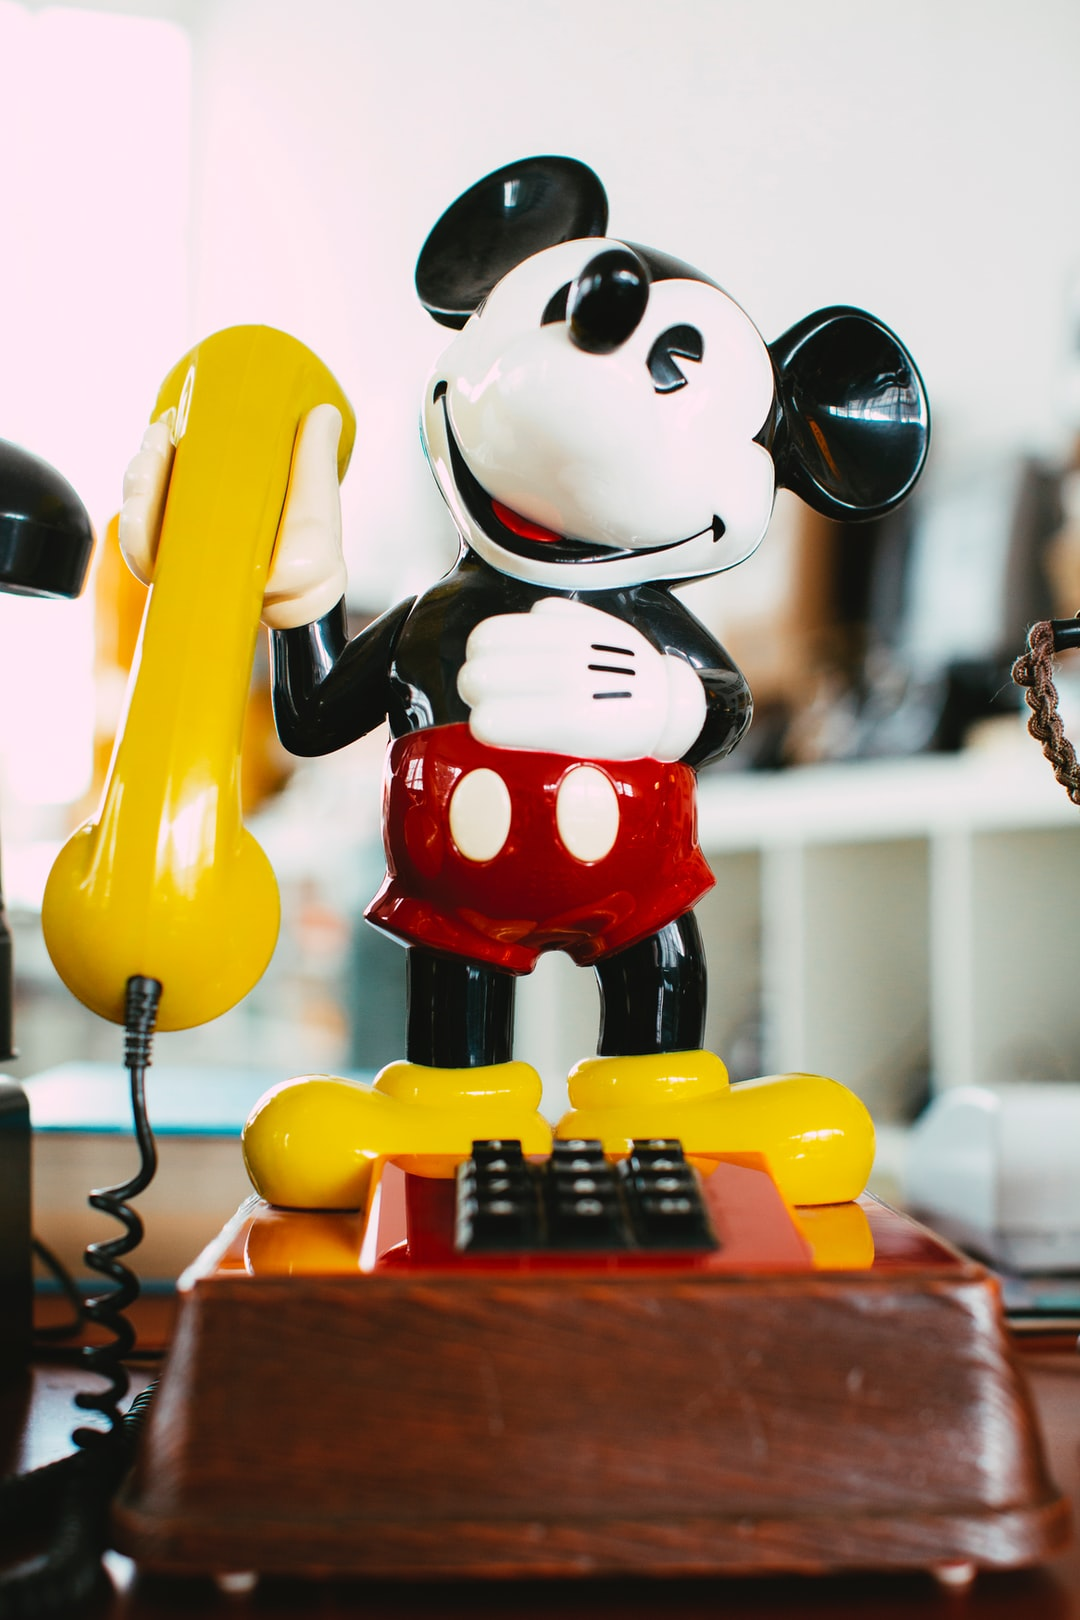 Vintage classic retro analog disney mickey mouse motive telephone